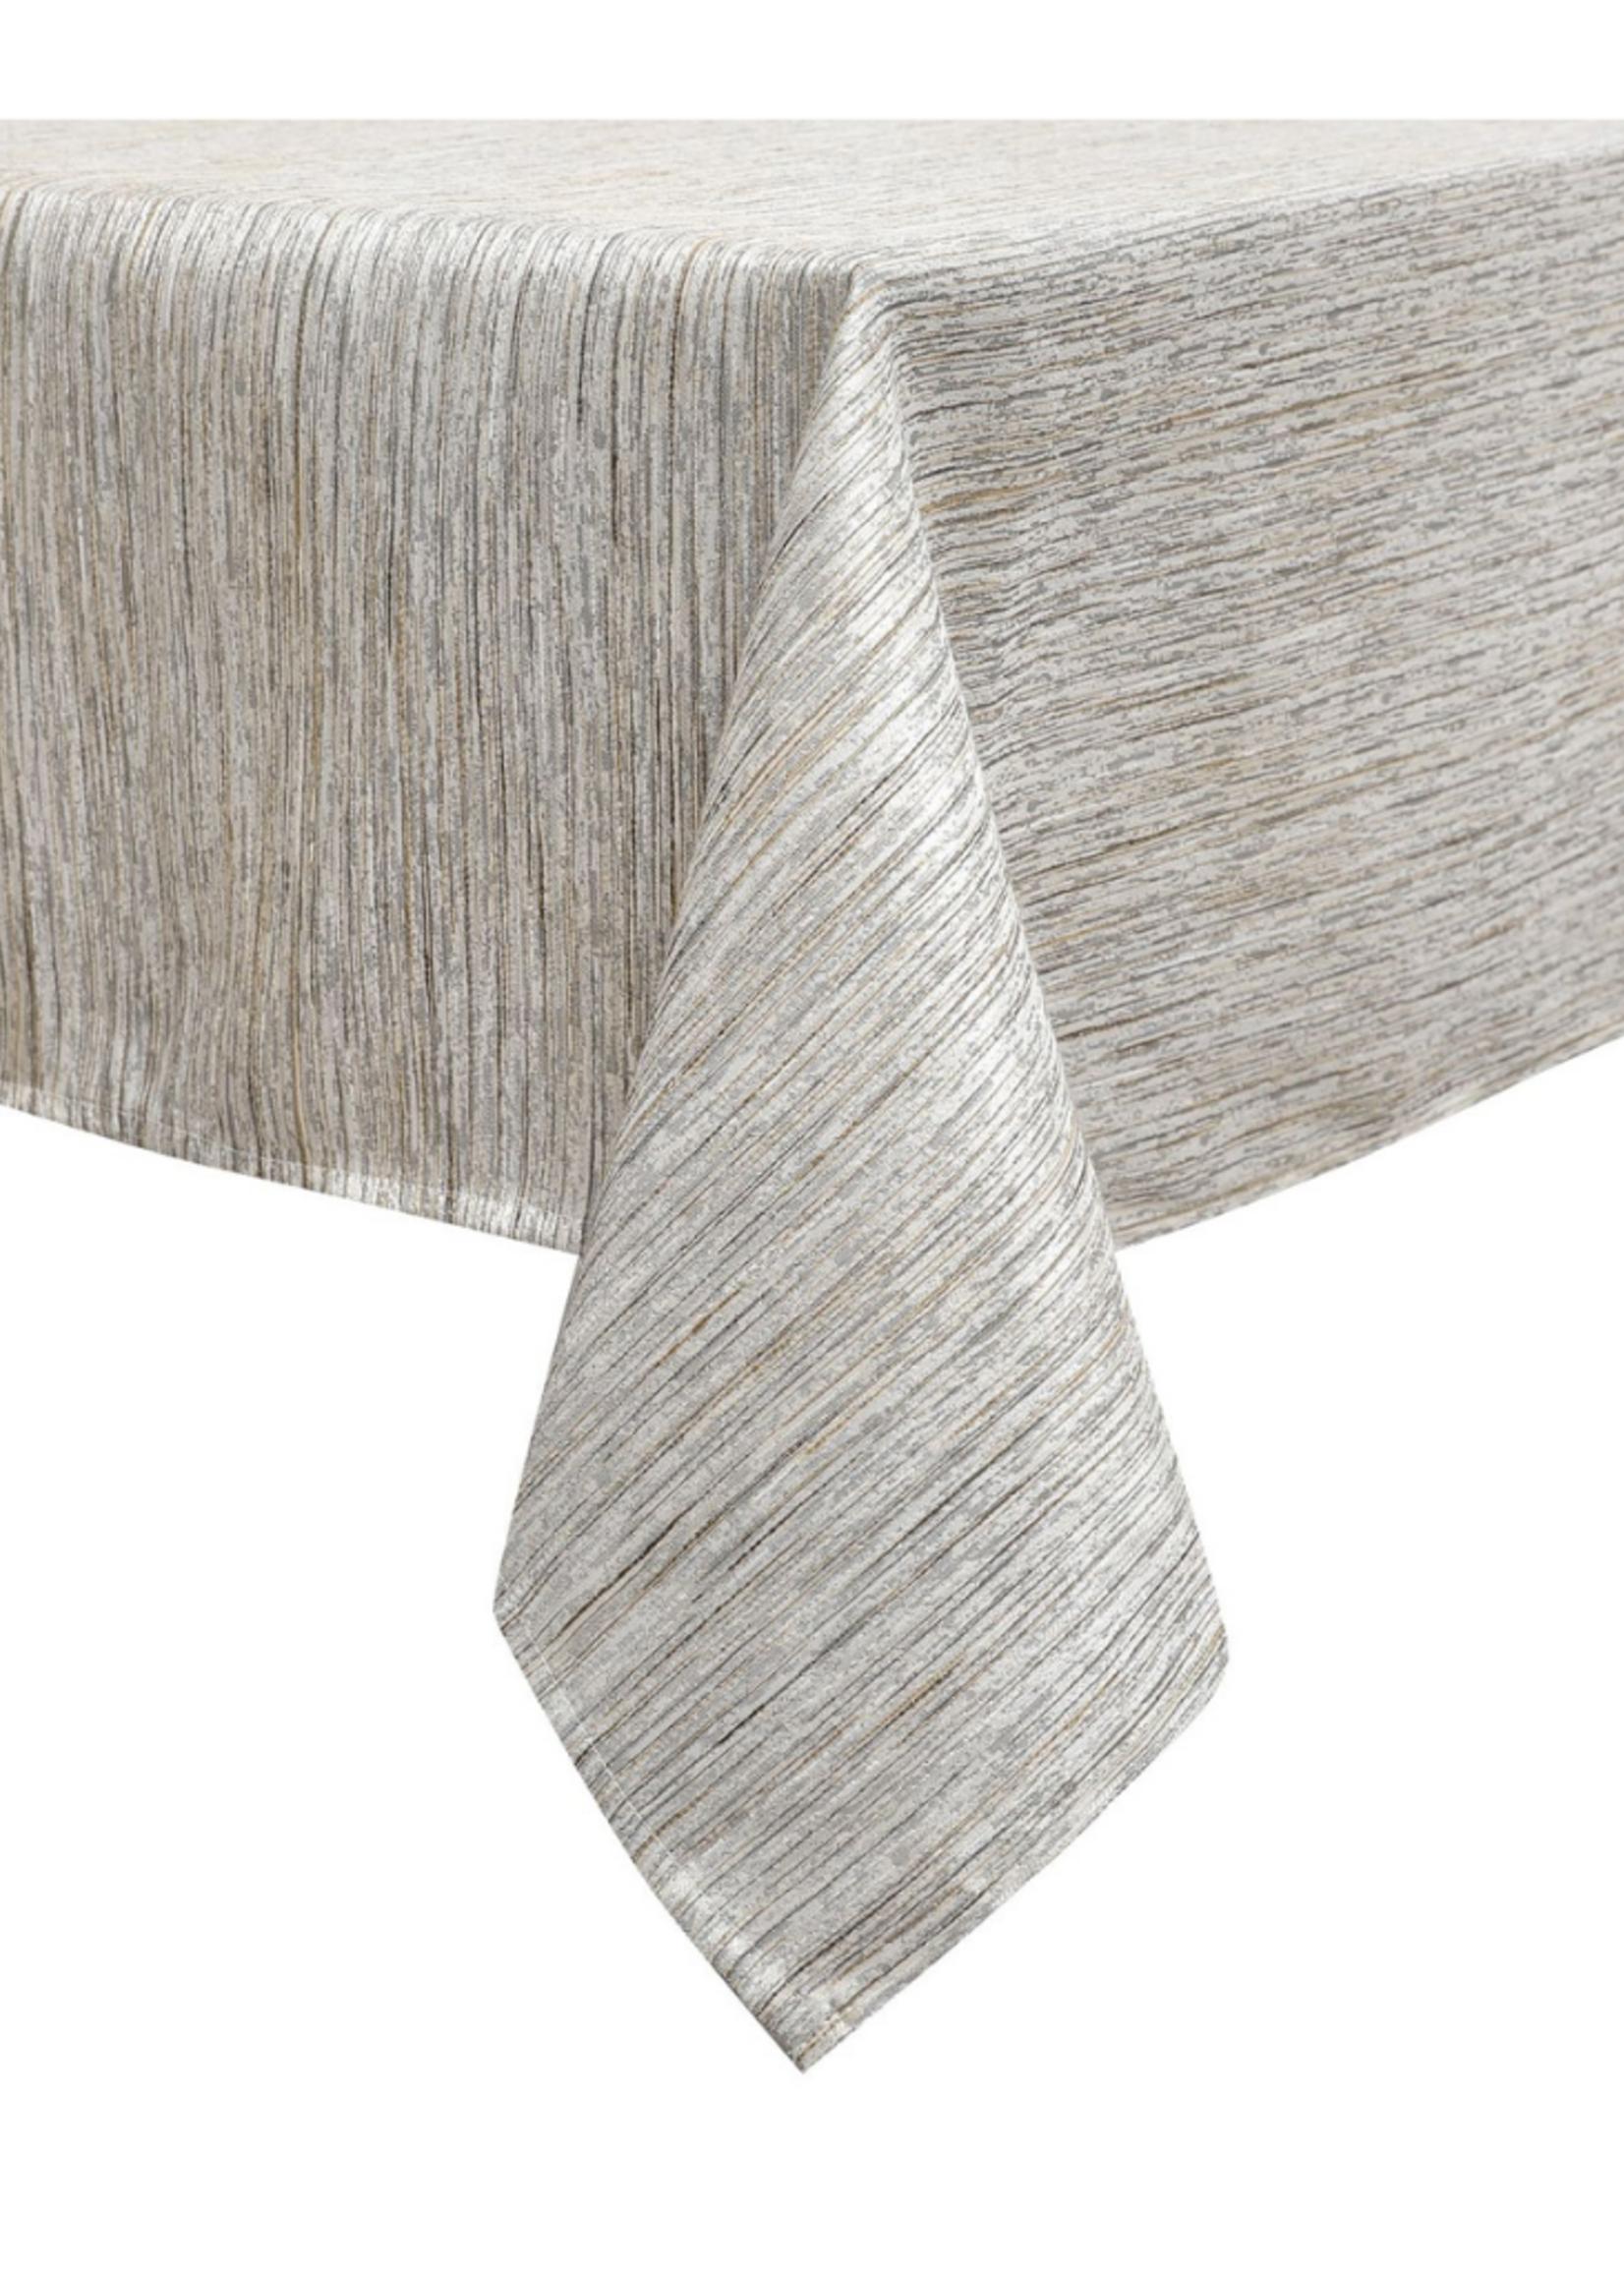 Jacquard Tablecloth Metallic Lines #1231